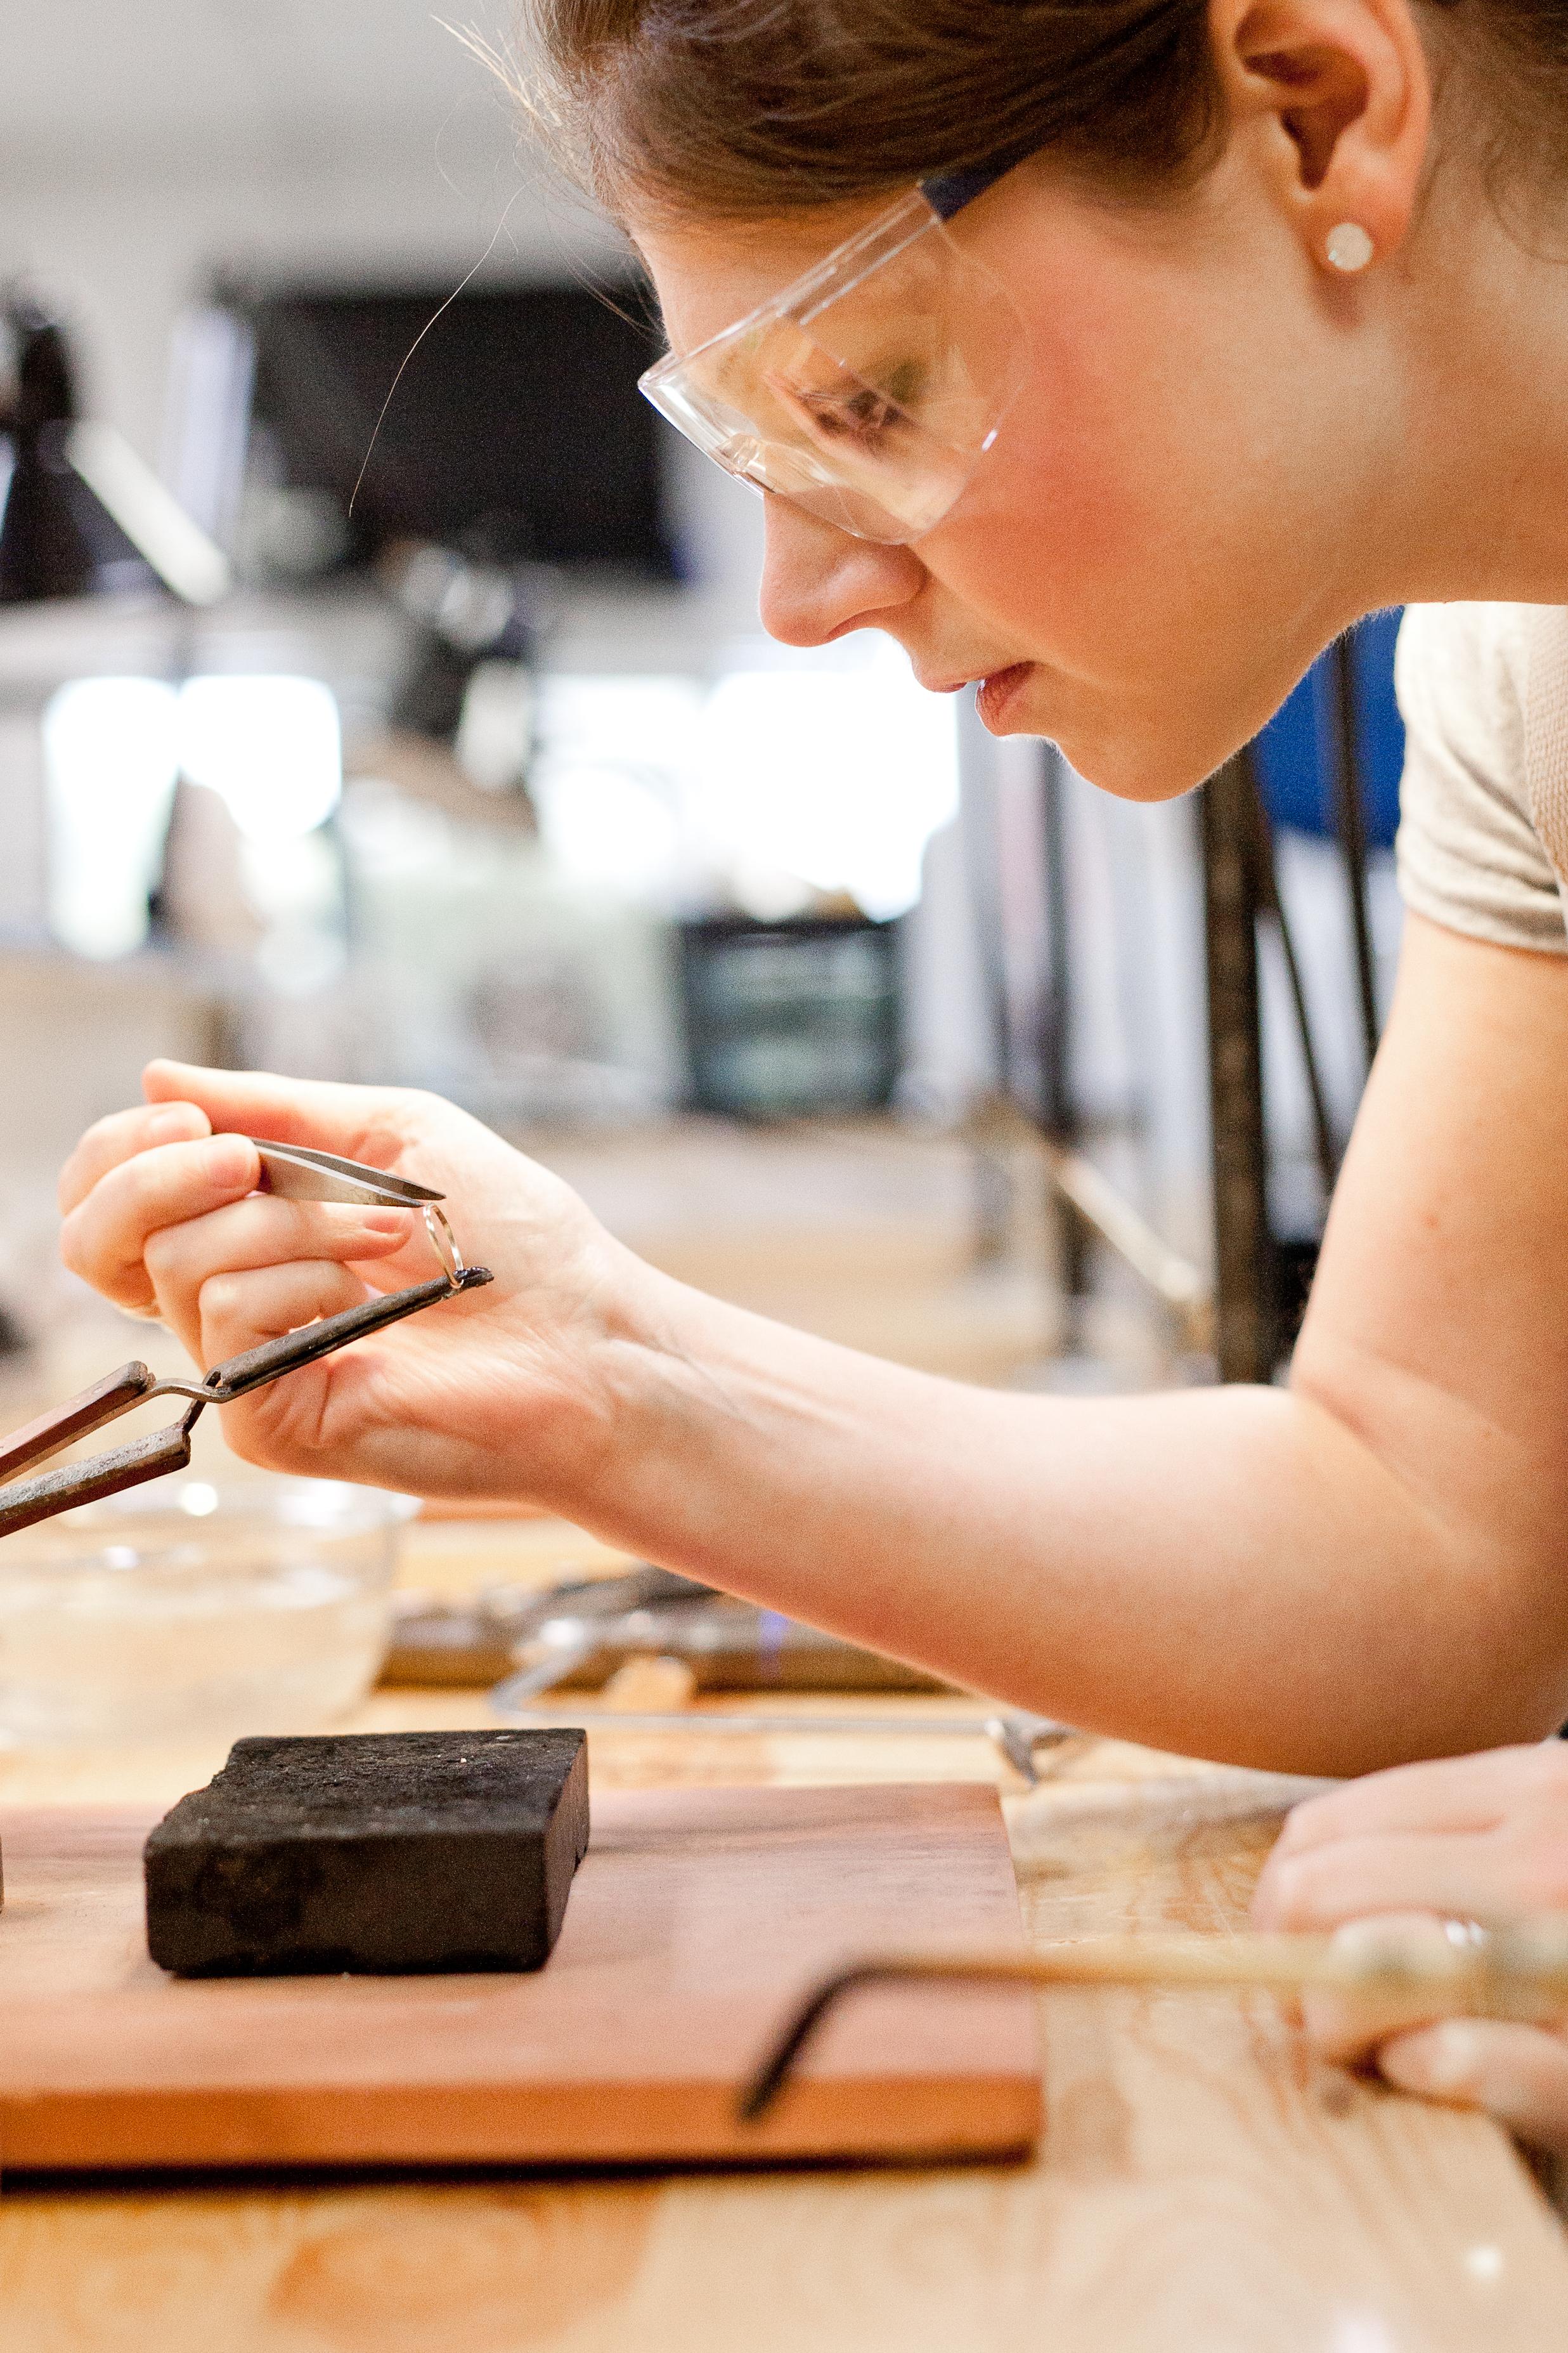 Breanna Whitener works in her studio. Photo: Jenni Roberts, courtesy Jenni Roberts Photography.